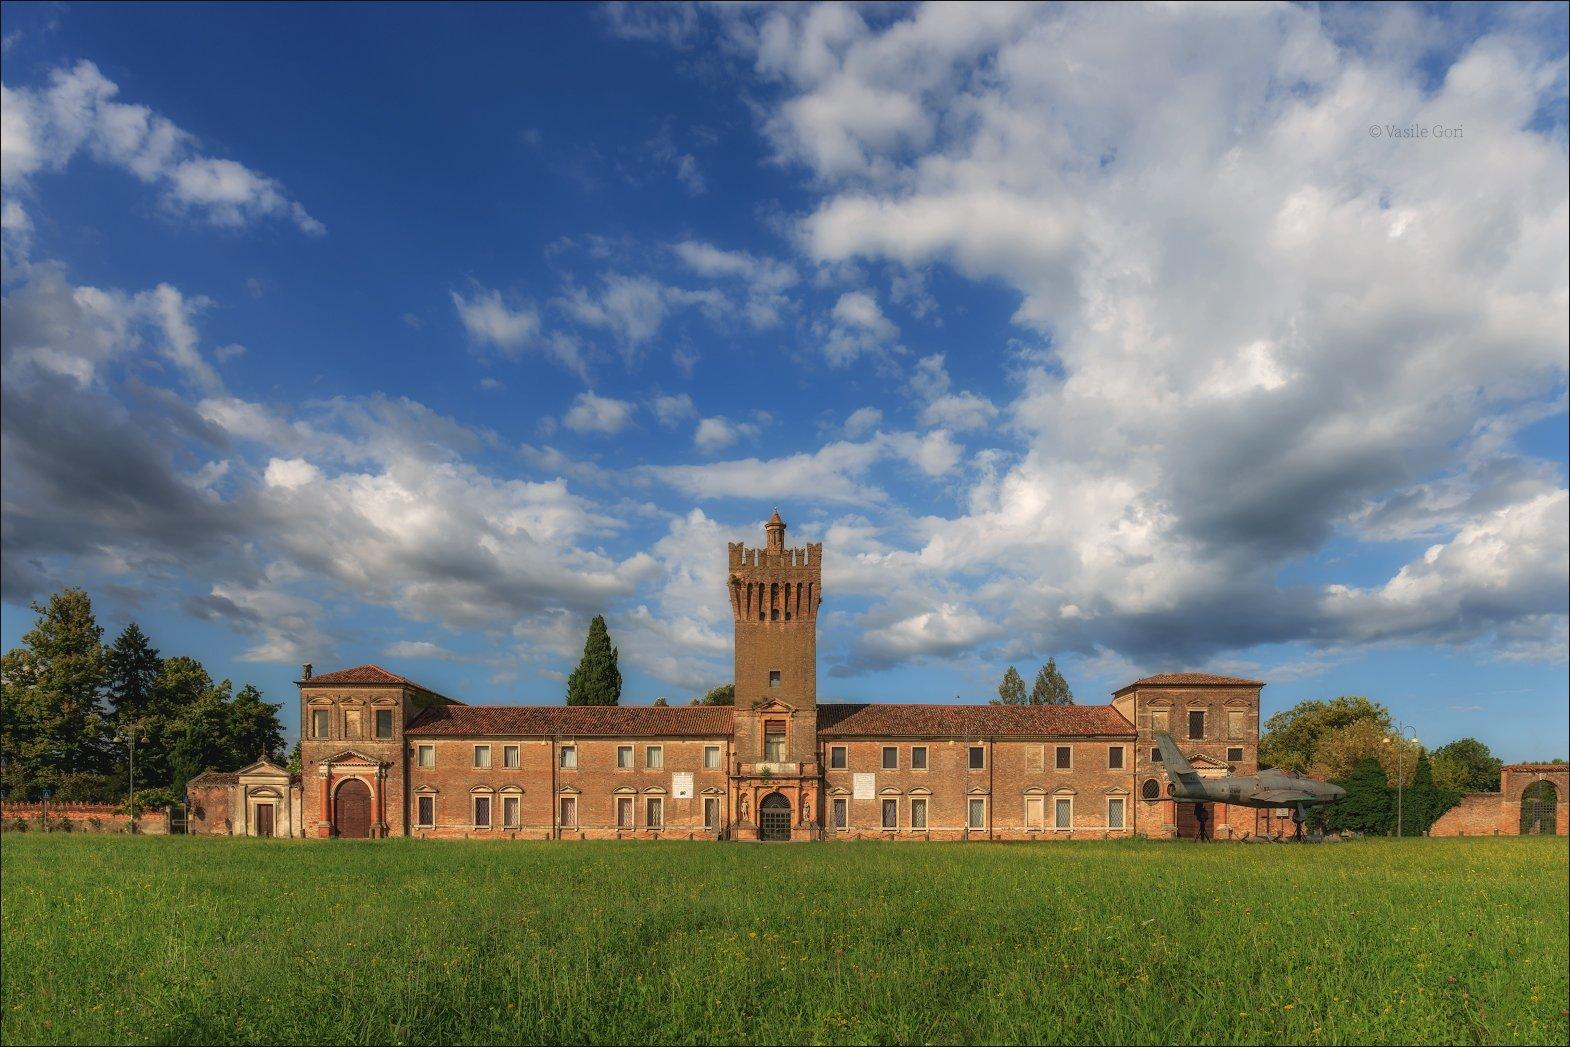 italy,san pelagio,colli euganei, вилла,италия,эвганские холмы,венето,castello, Василий Гори.